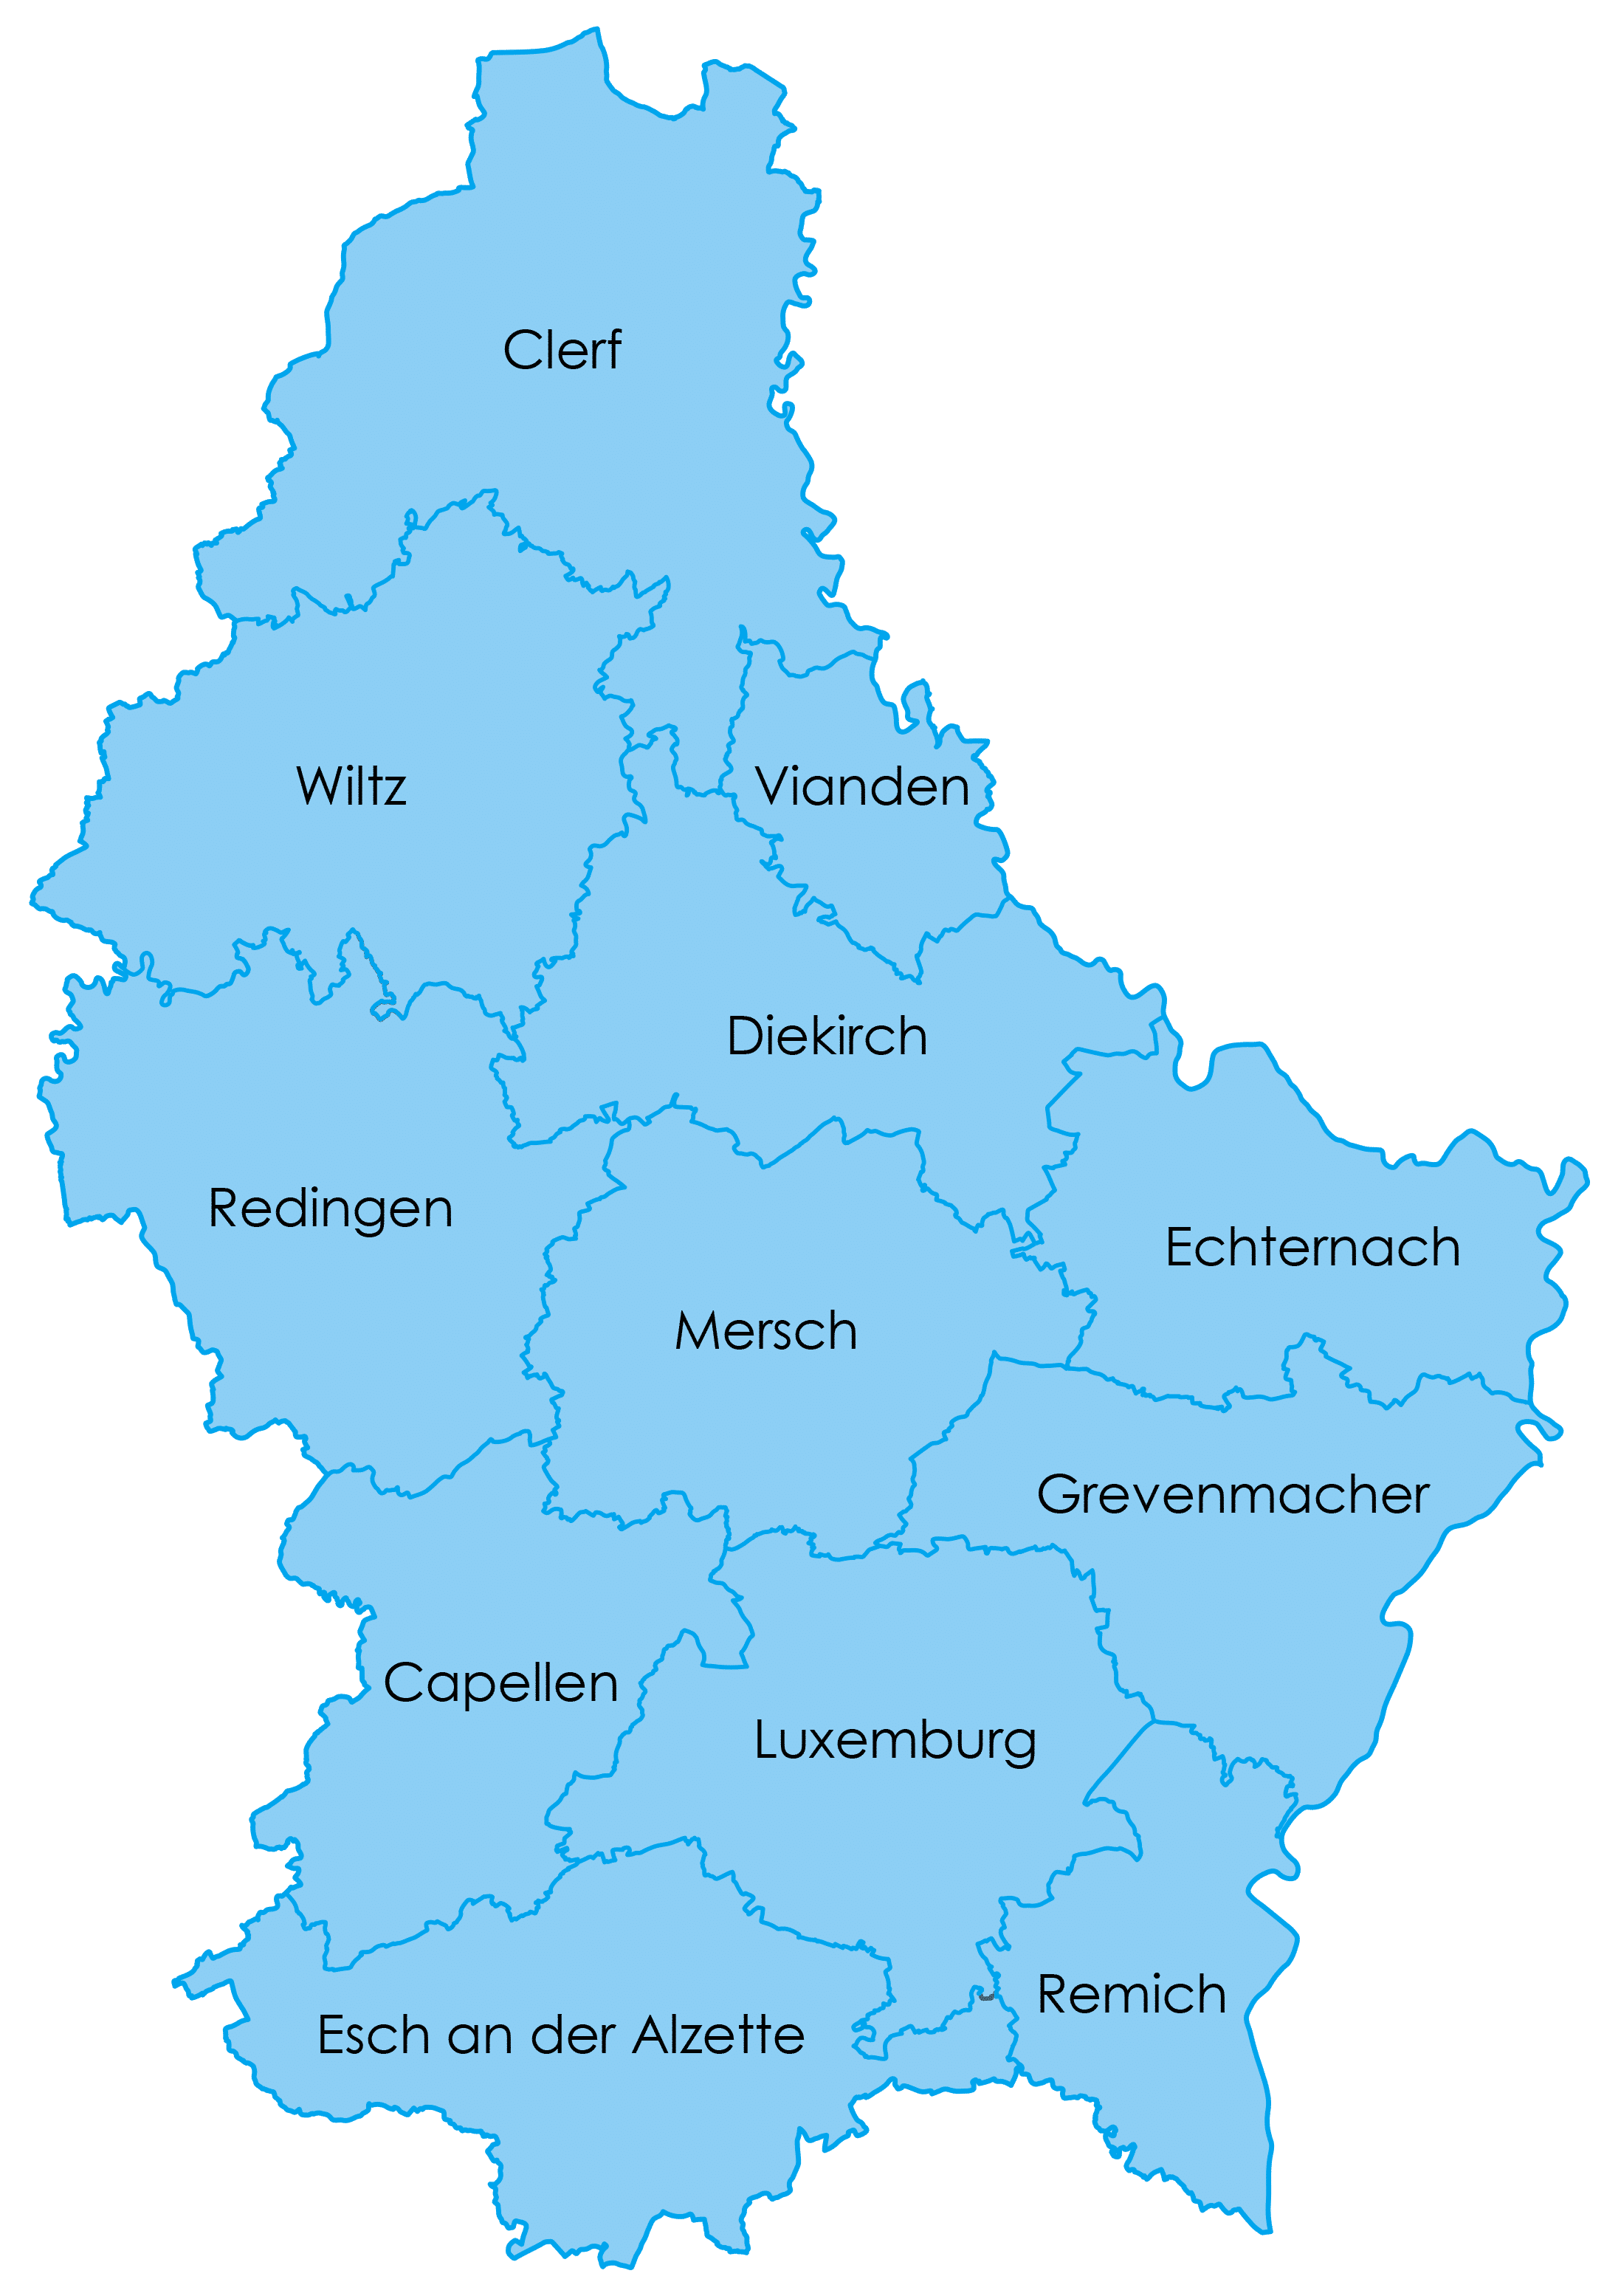 Dampfbad Partner in Luxemburg